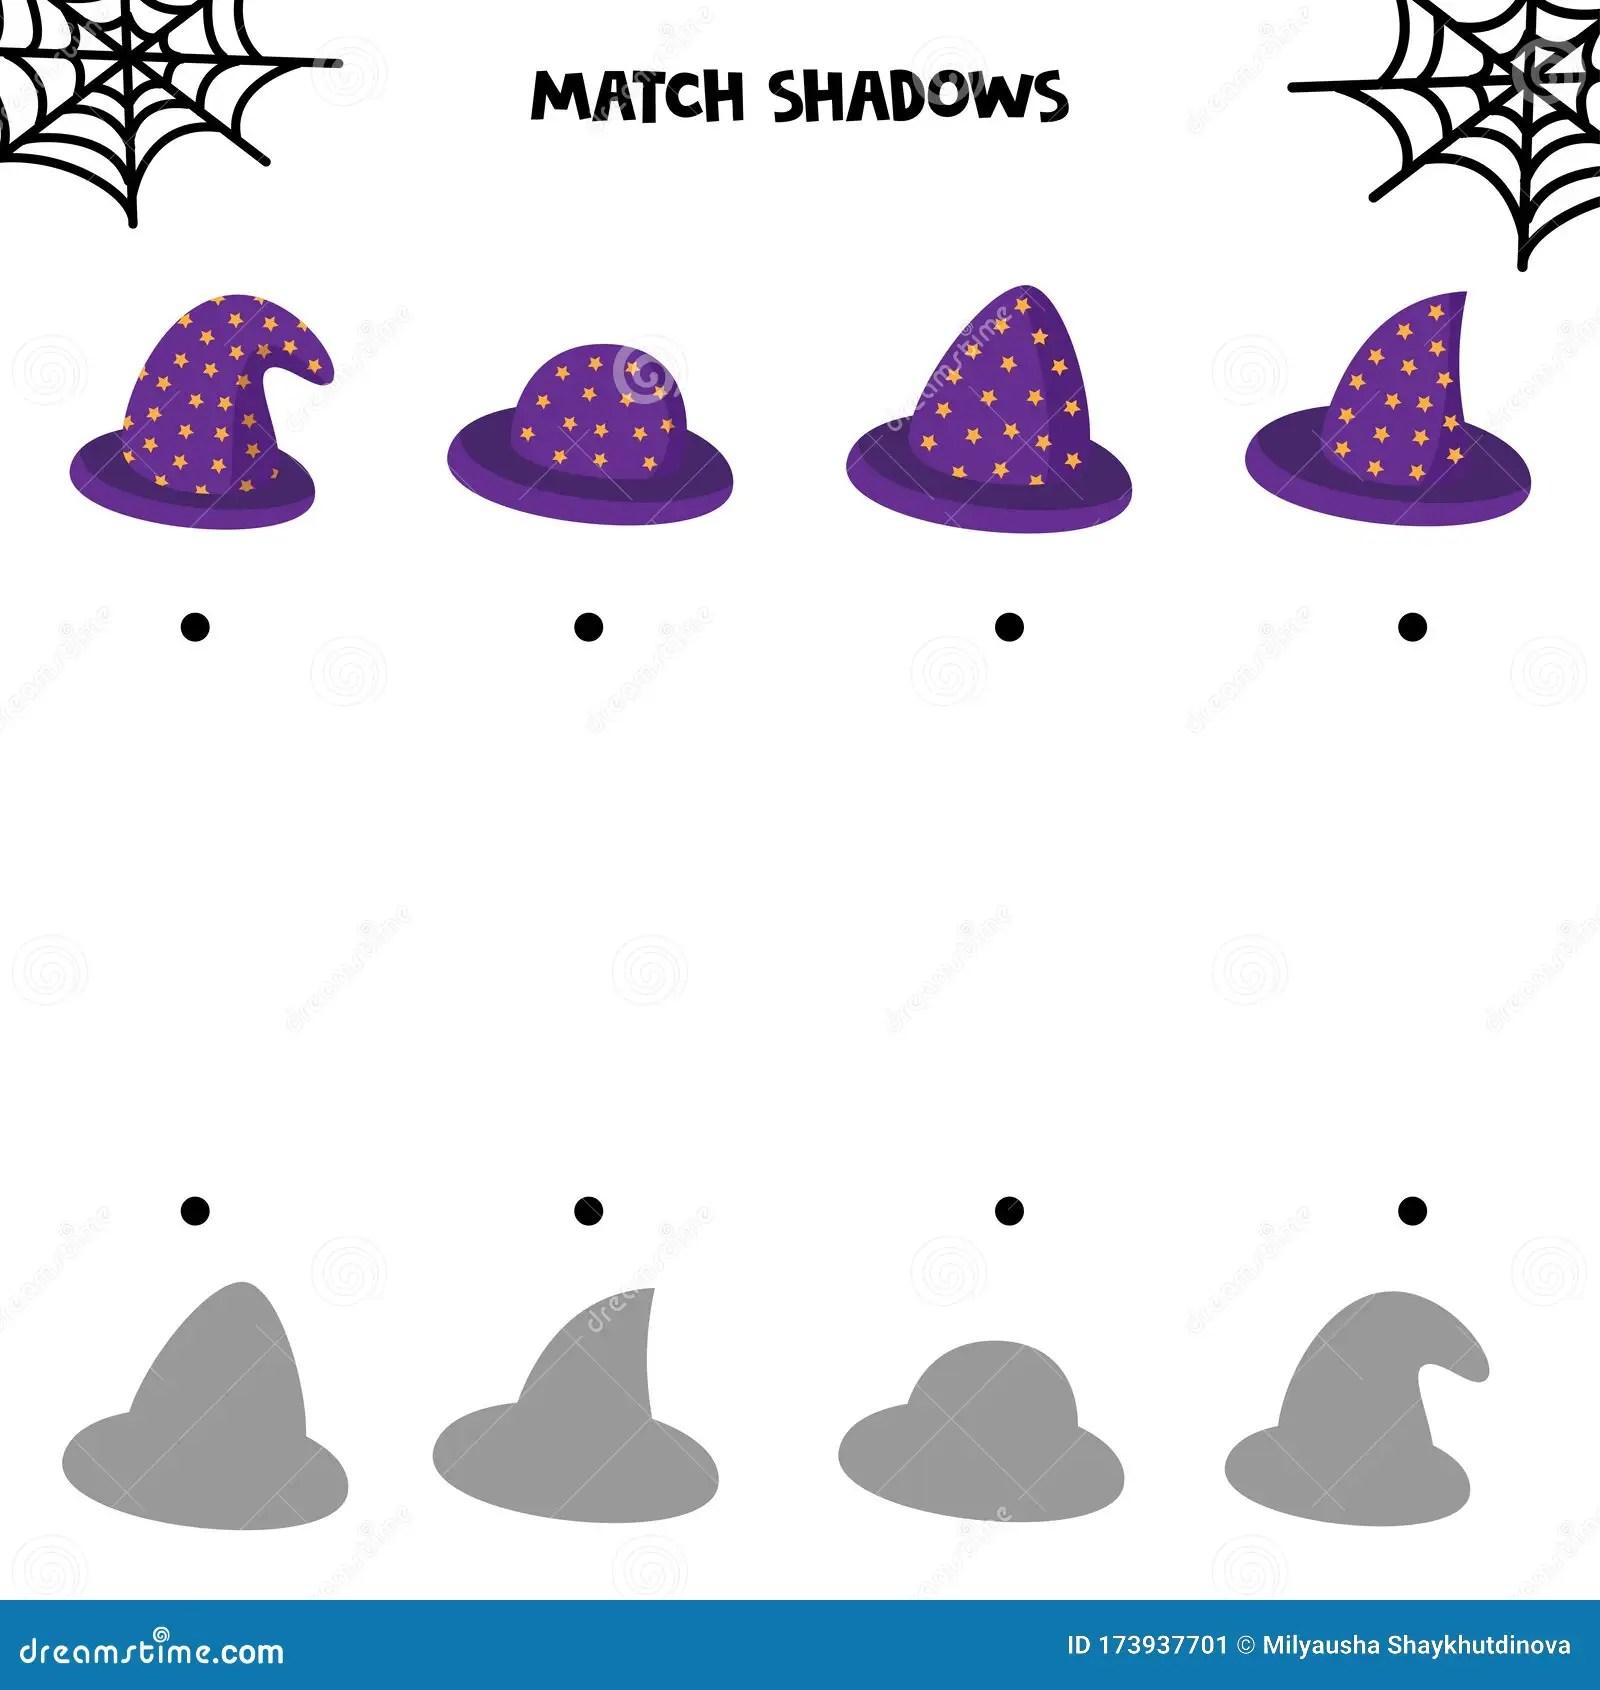 Educational Worksheet For Kids Halloween Games Match